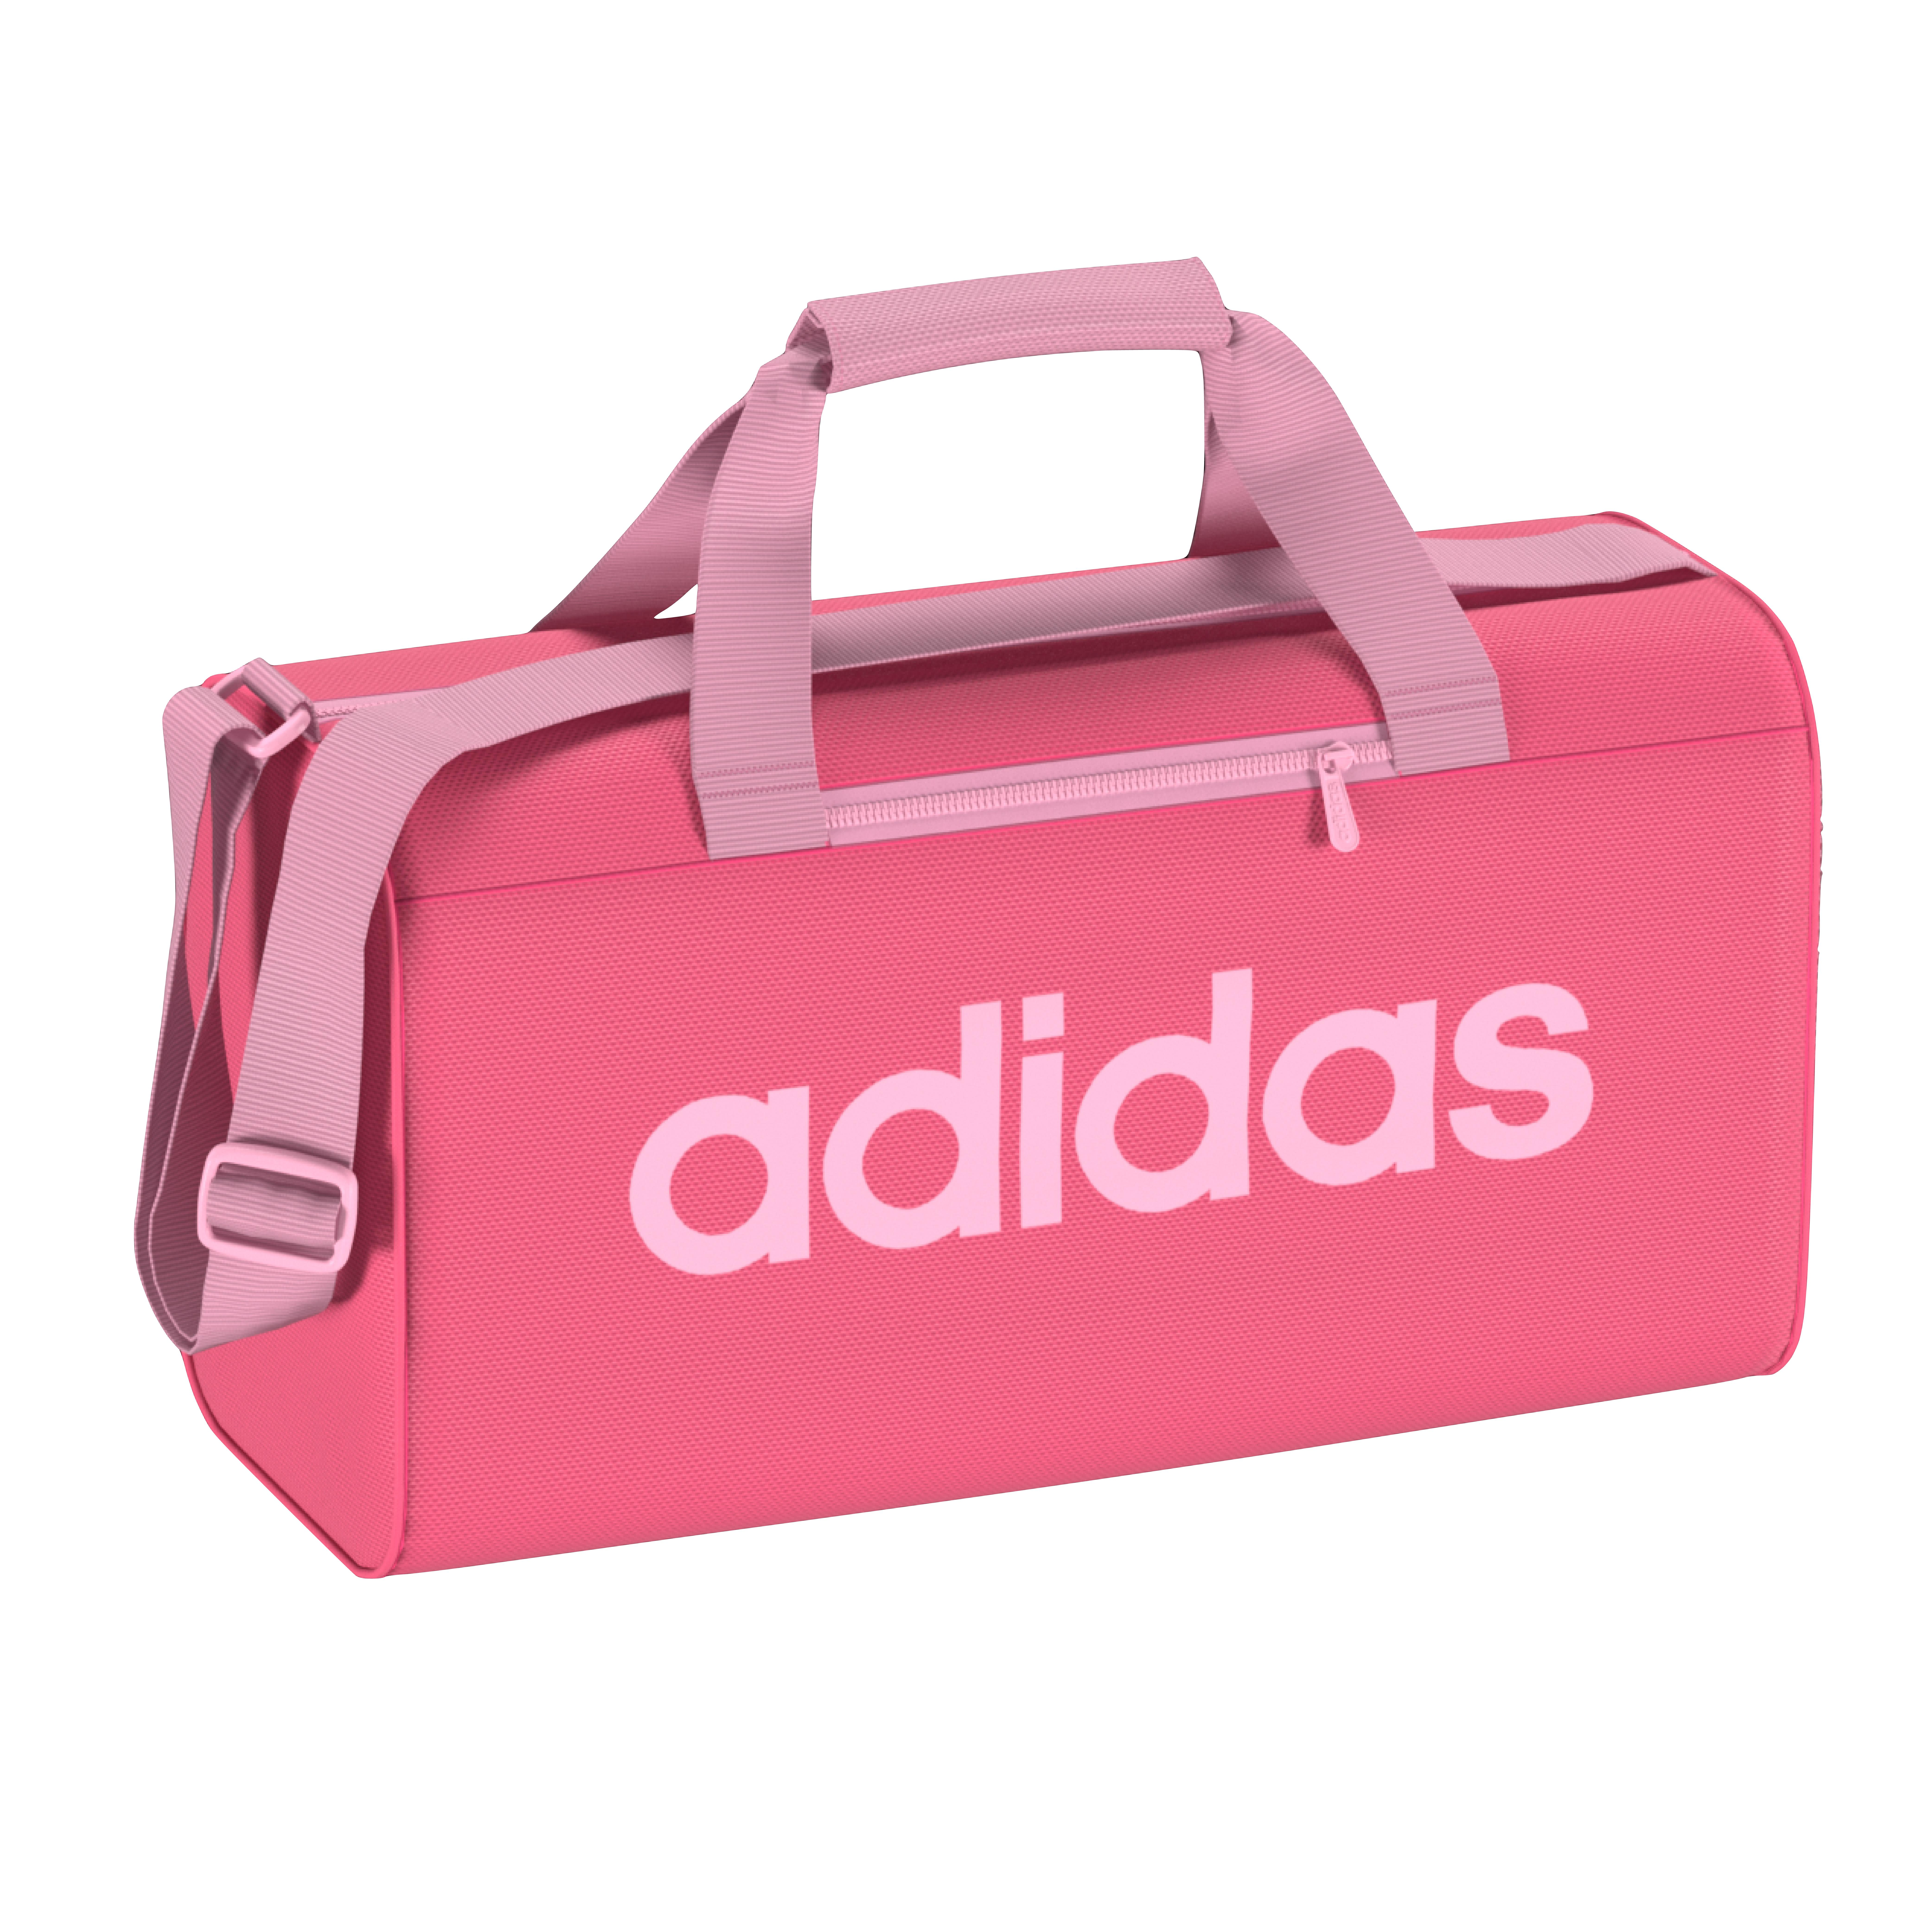 finest selection b04d1 5096d Adidas   Ropa   Zapatillas   en Decathlon